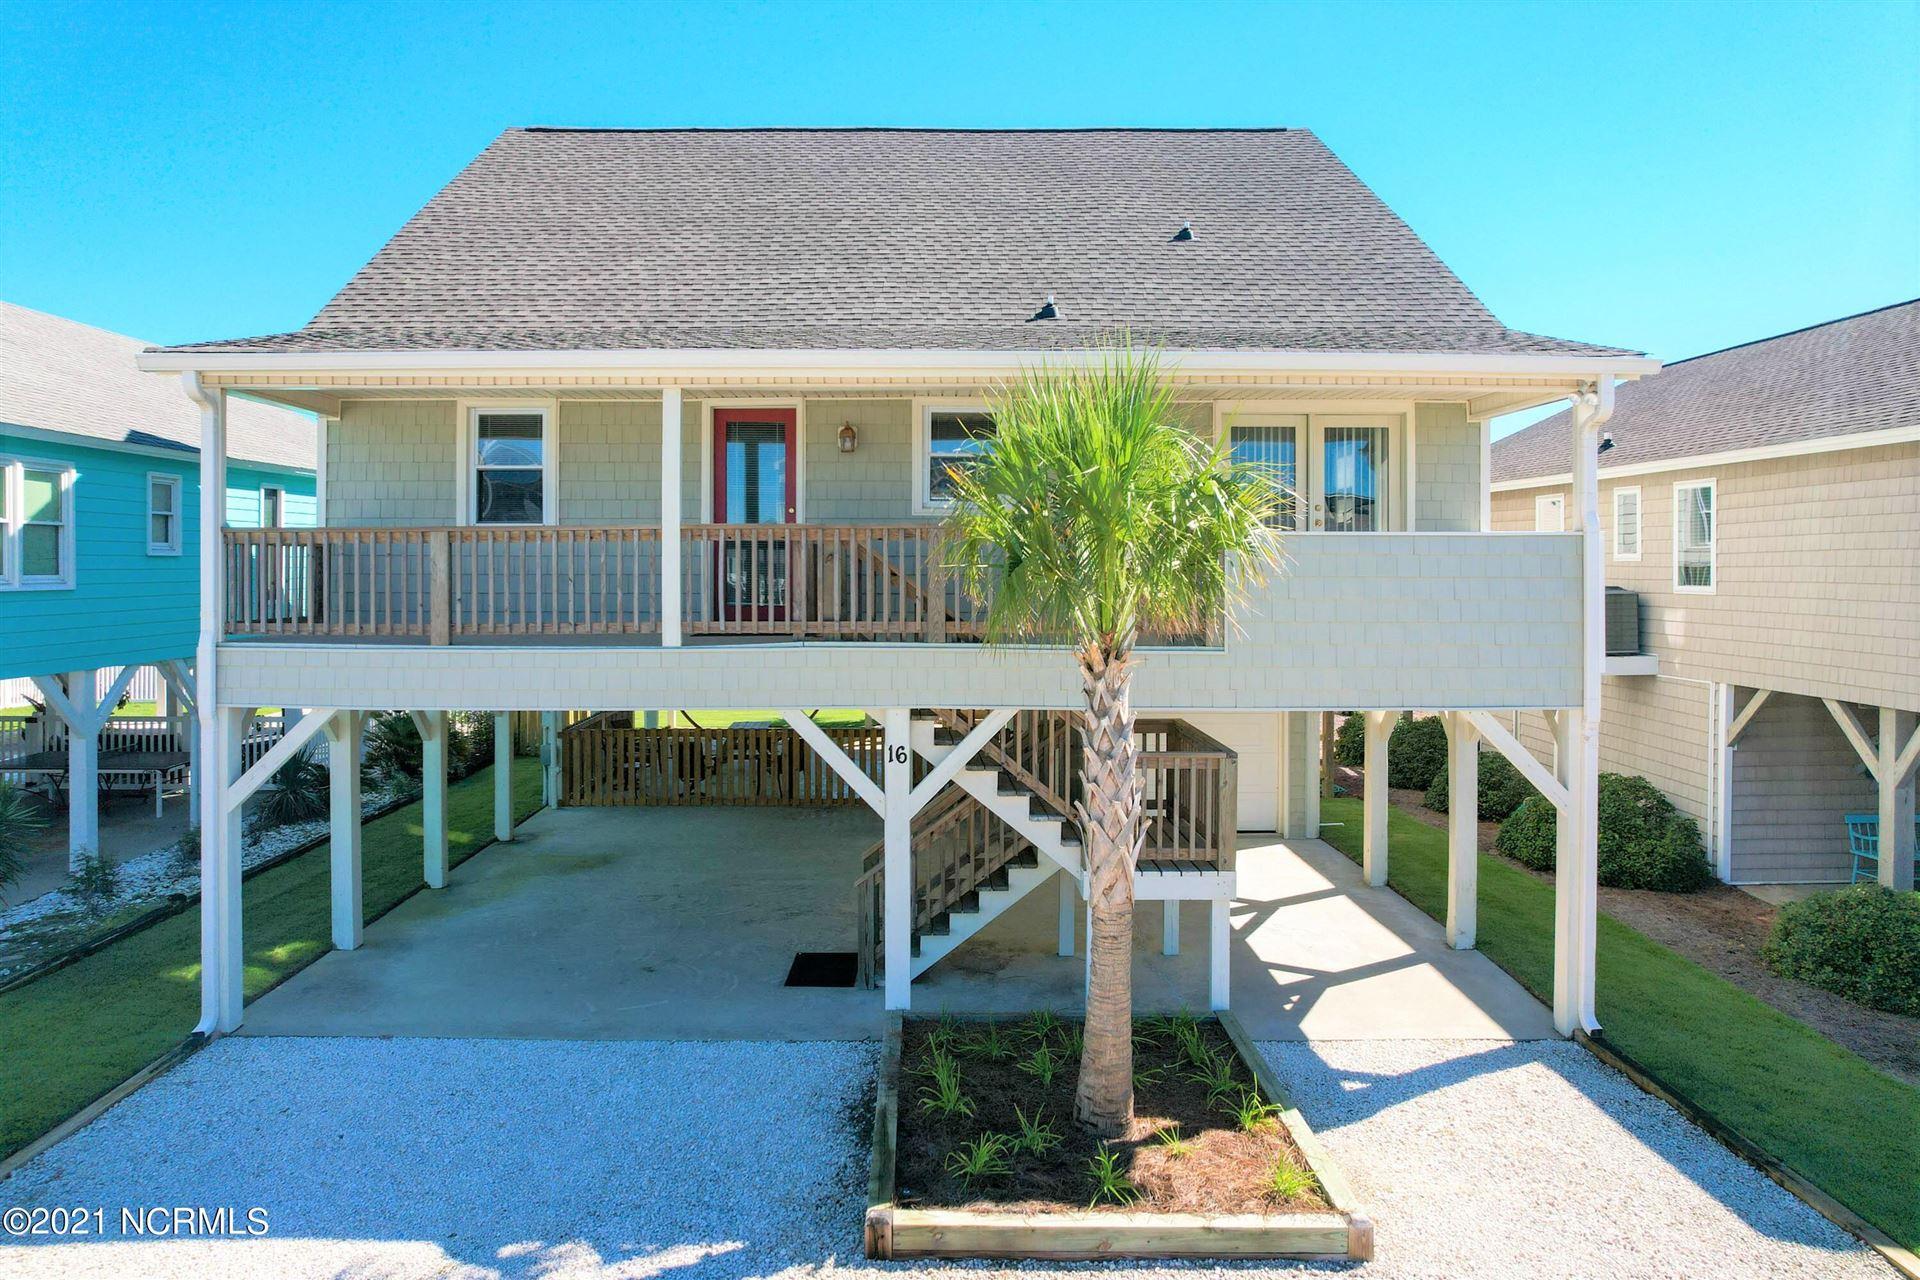 Photo of 16 Anson Street, Ocean Isle Beach, NC 28469 (MLS # 100292218)